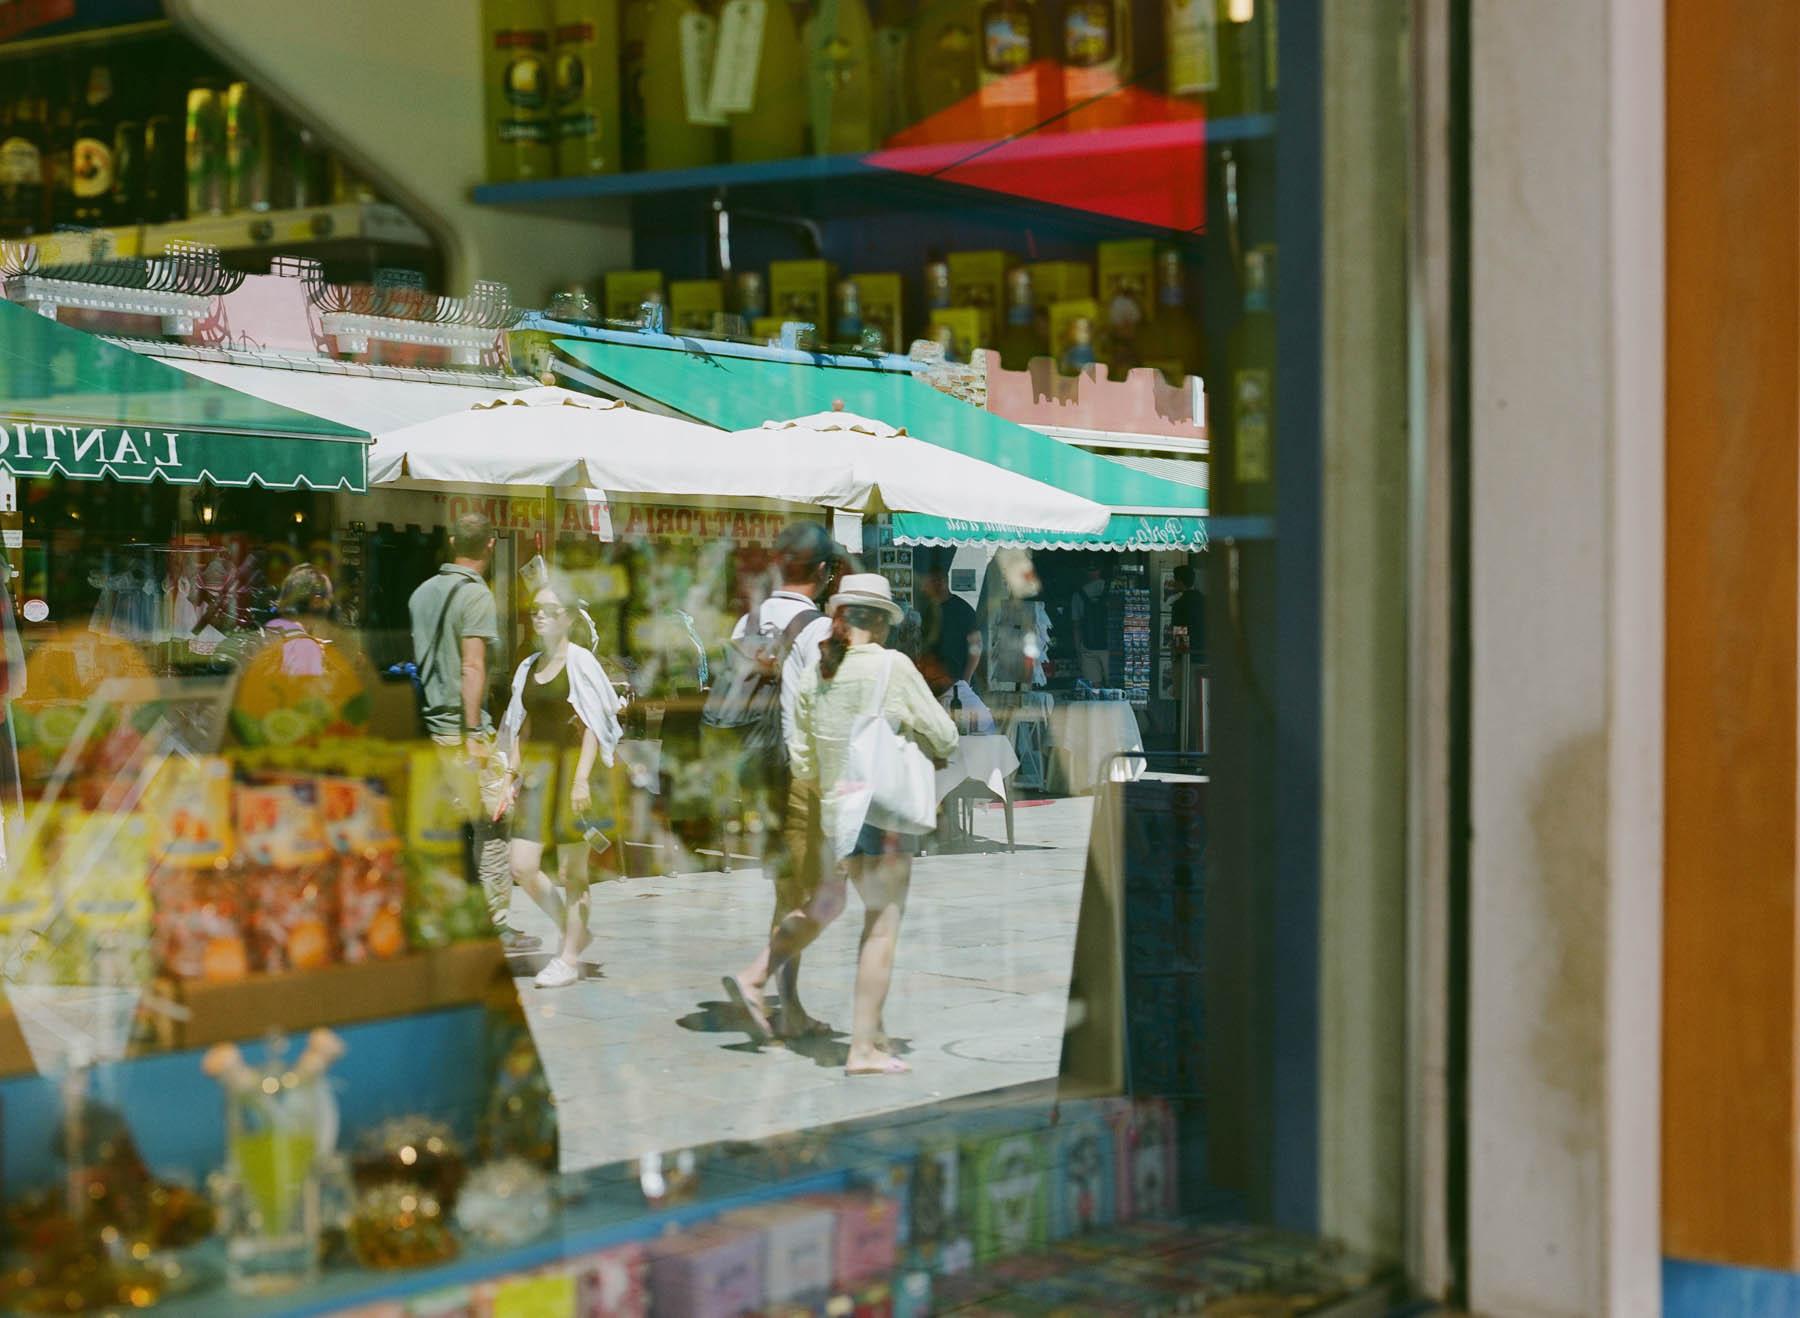 Tourists | Pentax 645n | Fuji 160NS